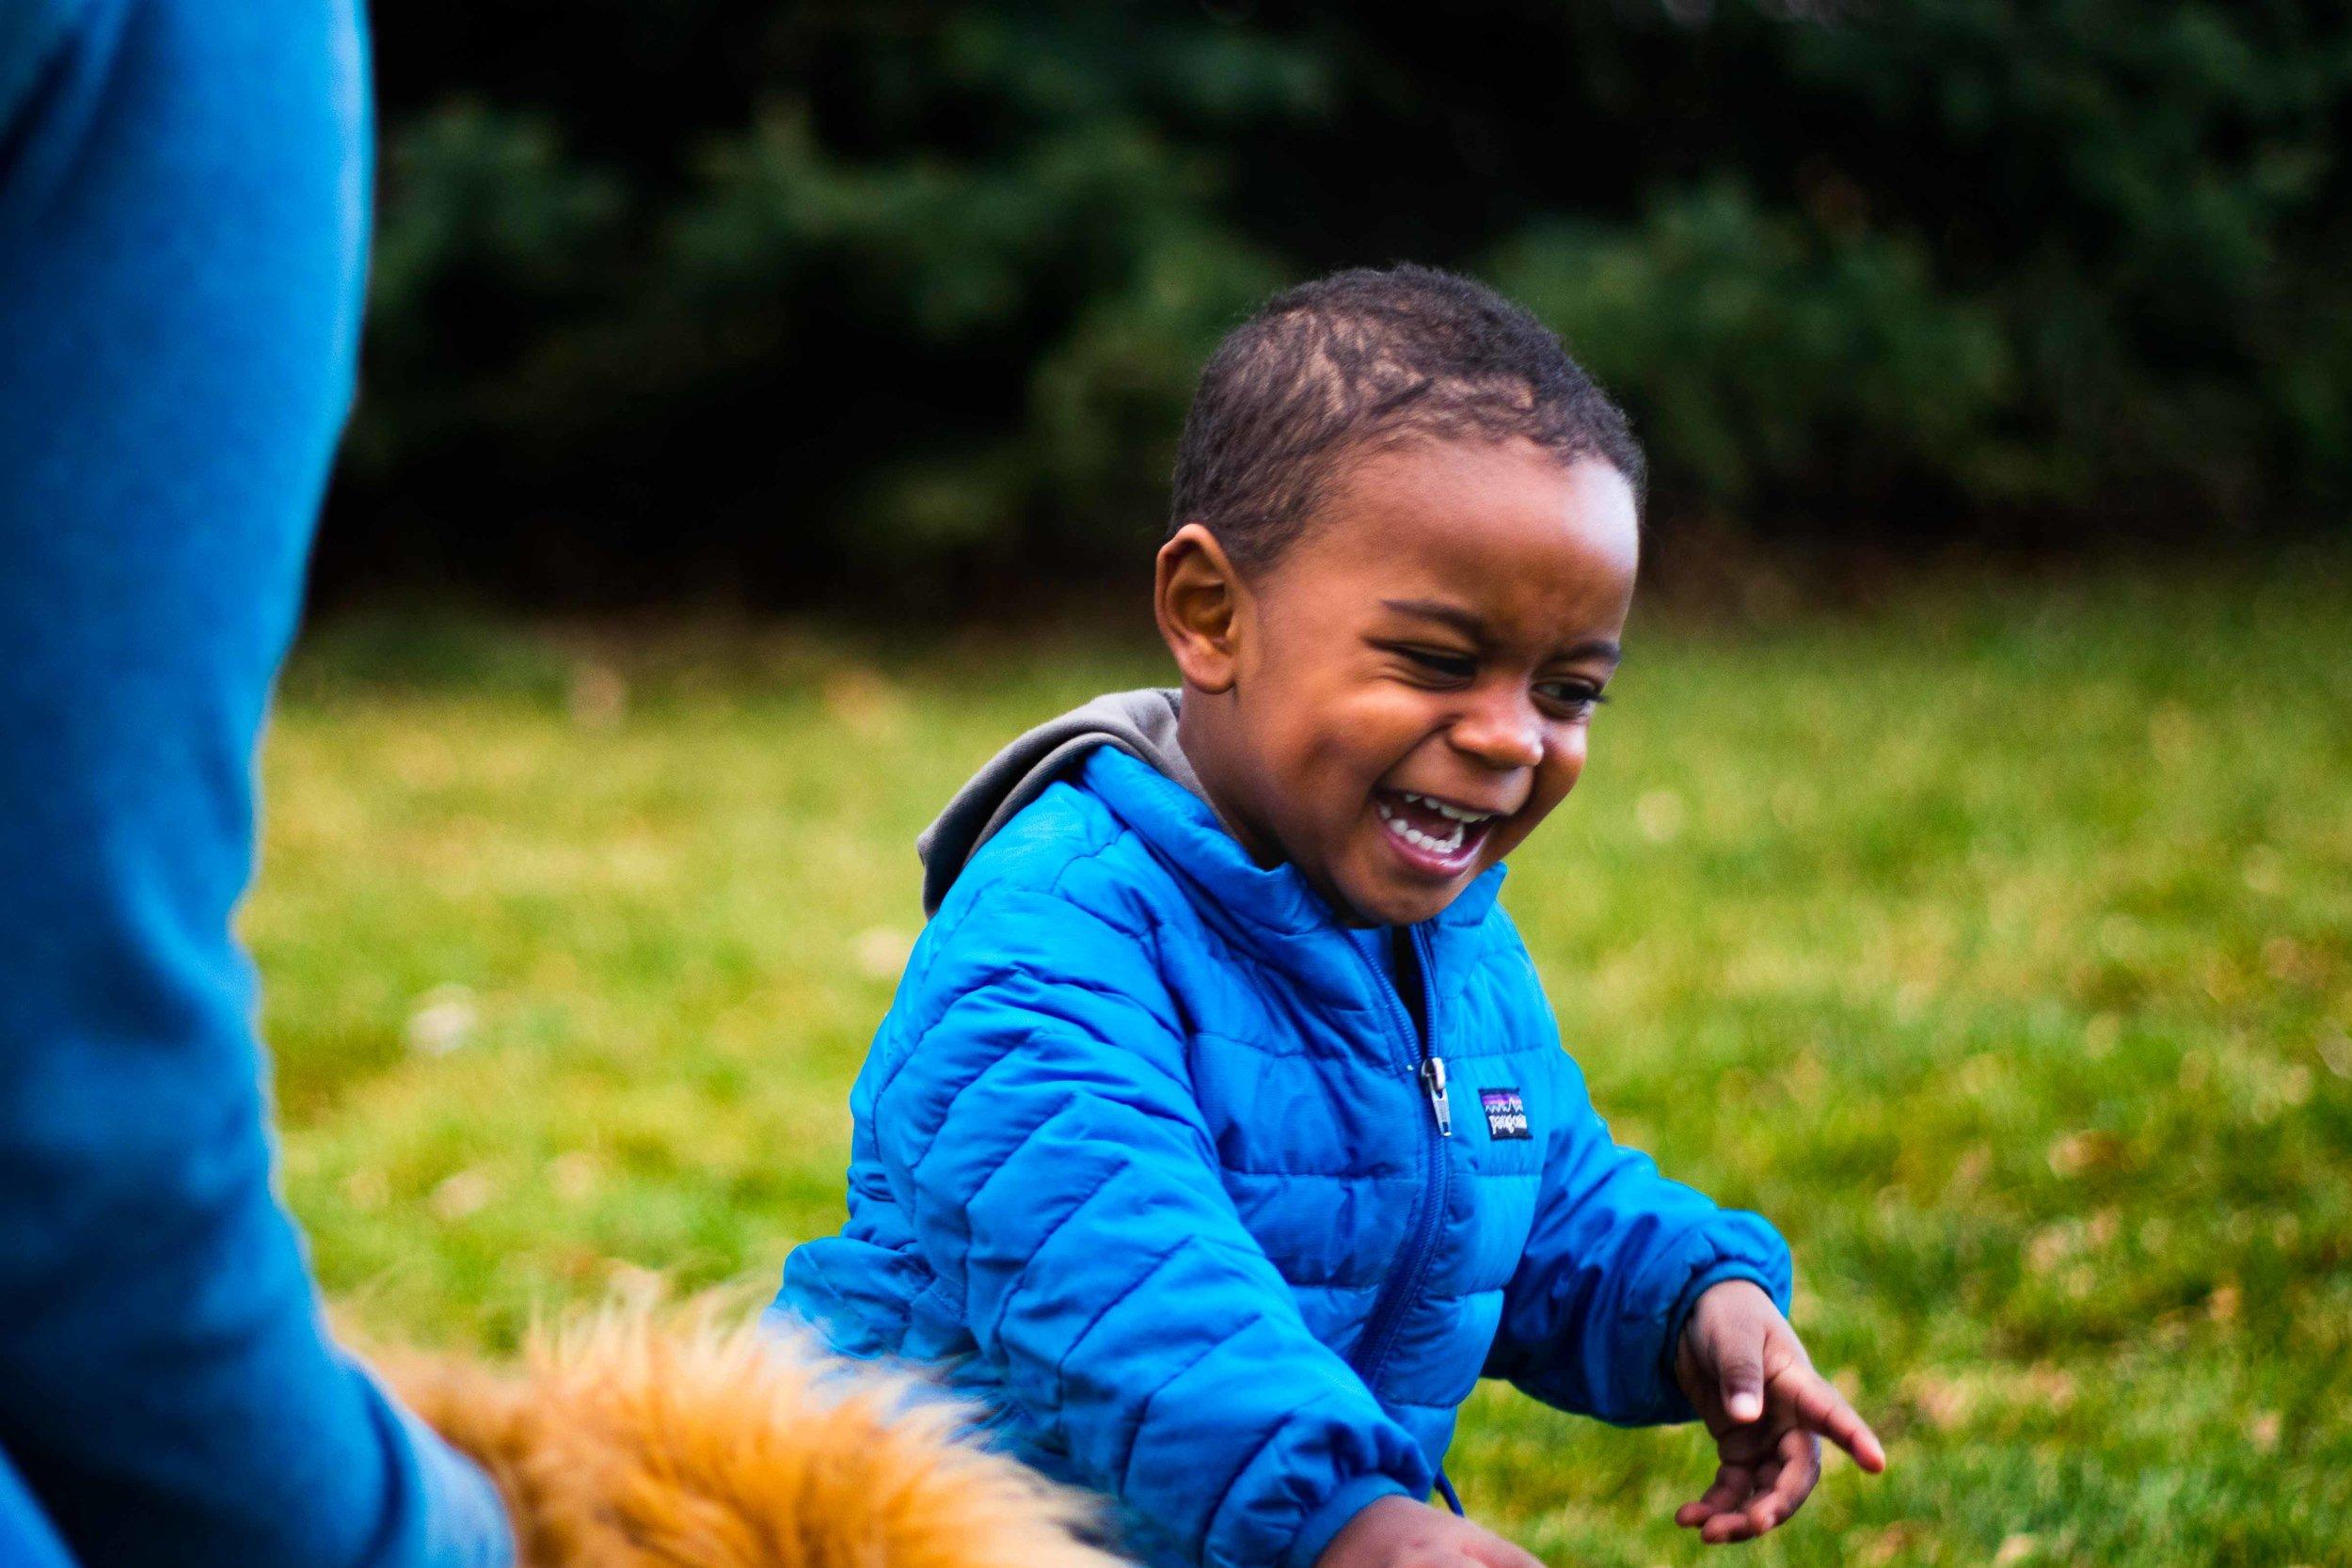 A Little Boy Laughing